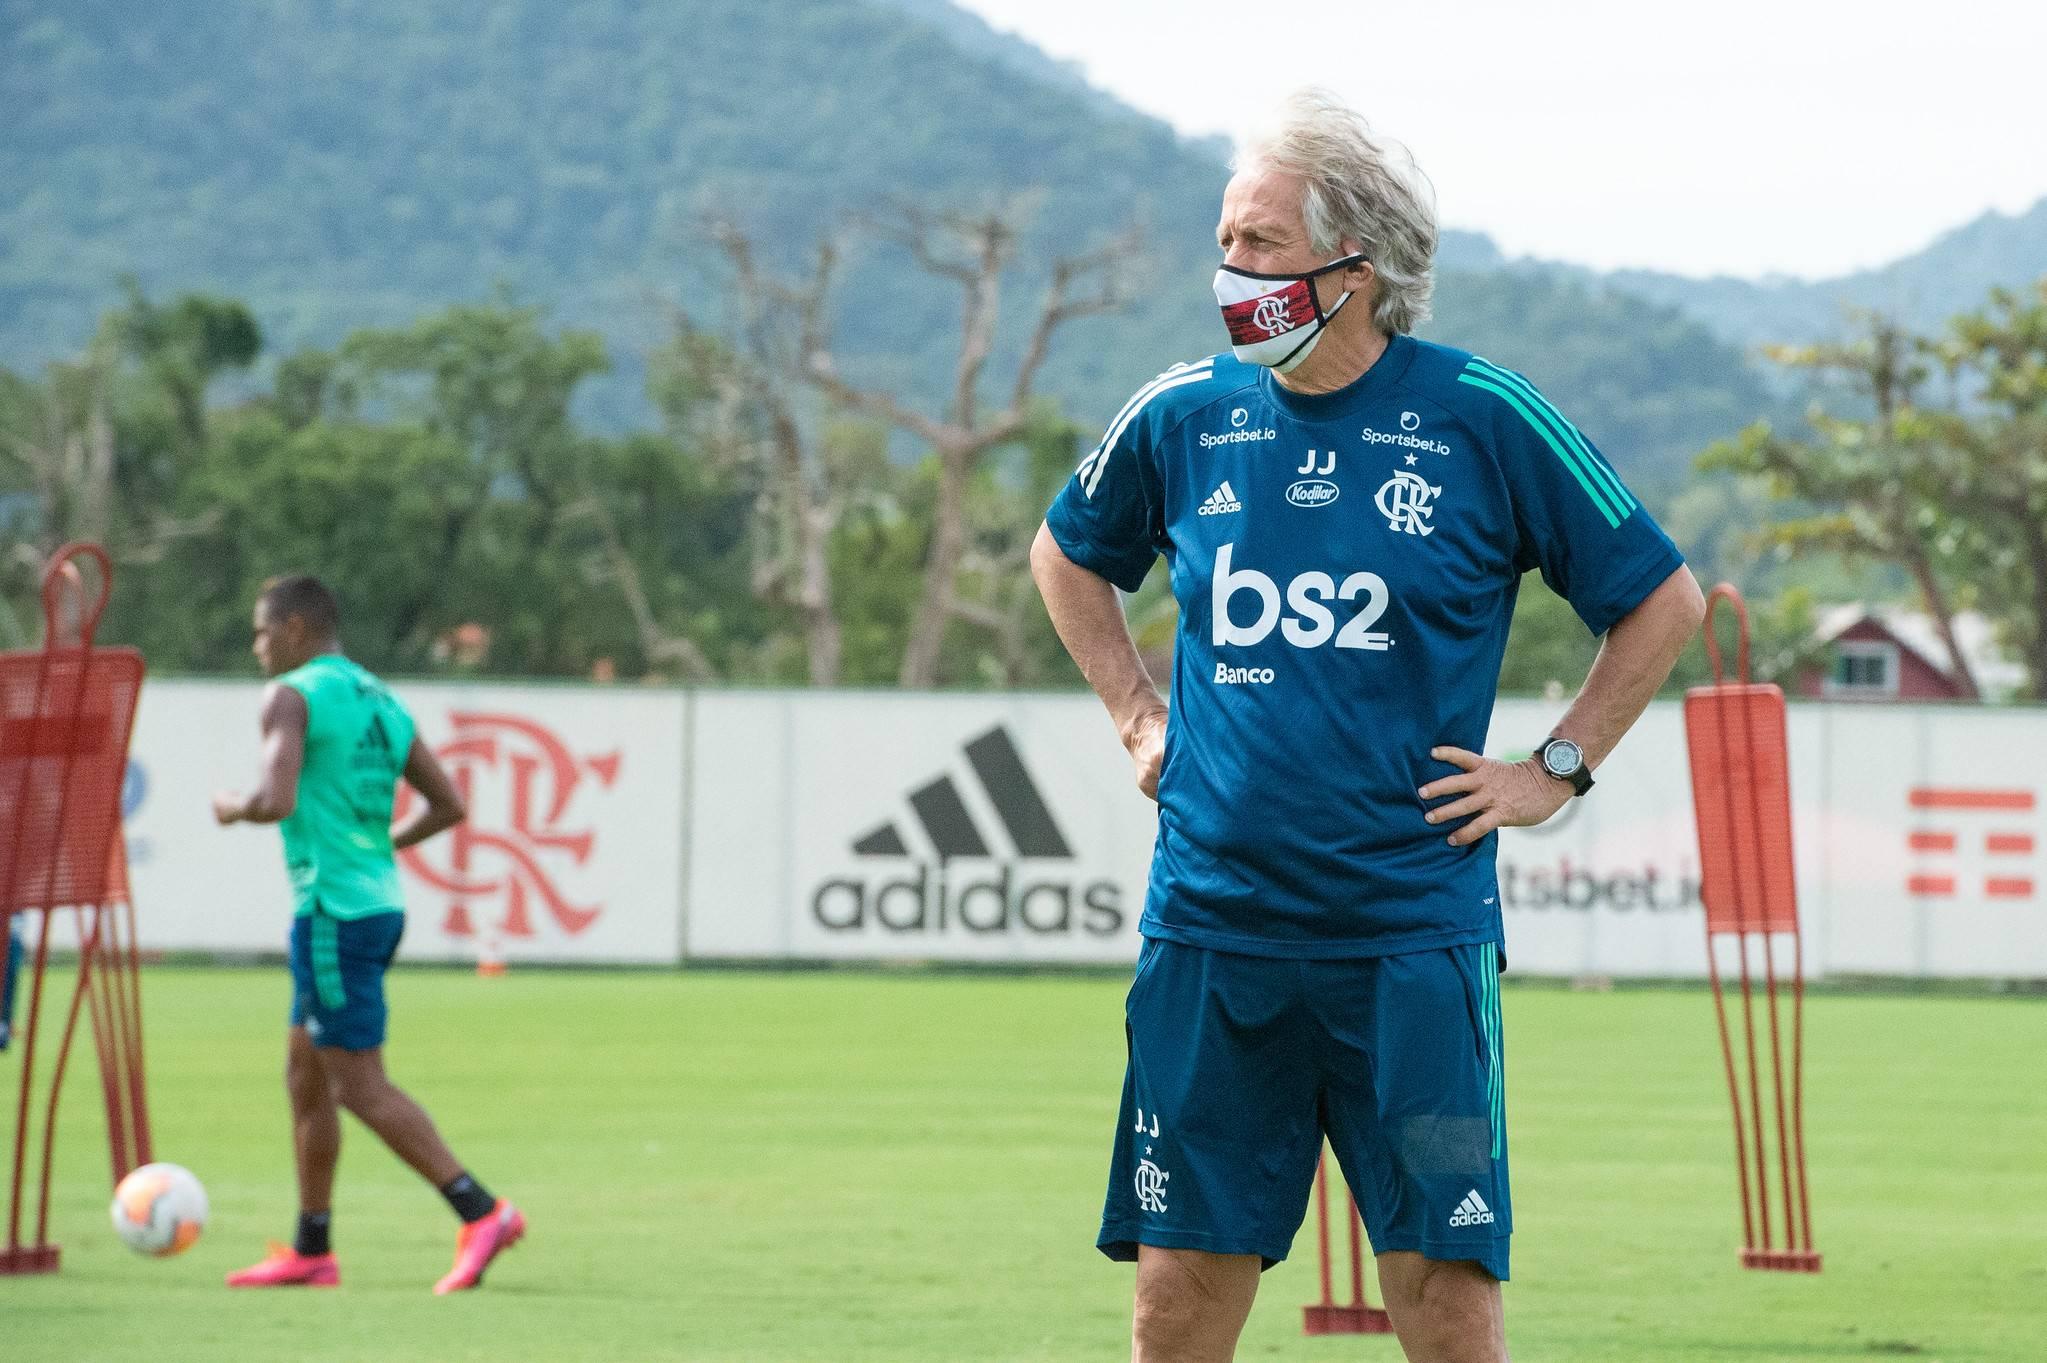 Jorge Jesus comanda treino no Flamengo. Foto: Alexandre Vidal/Flamengo.